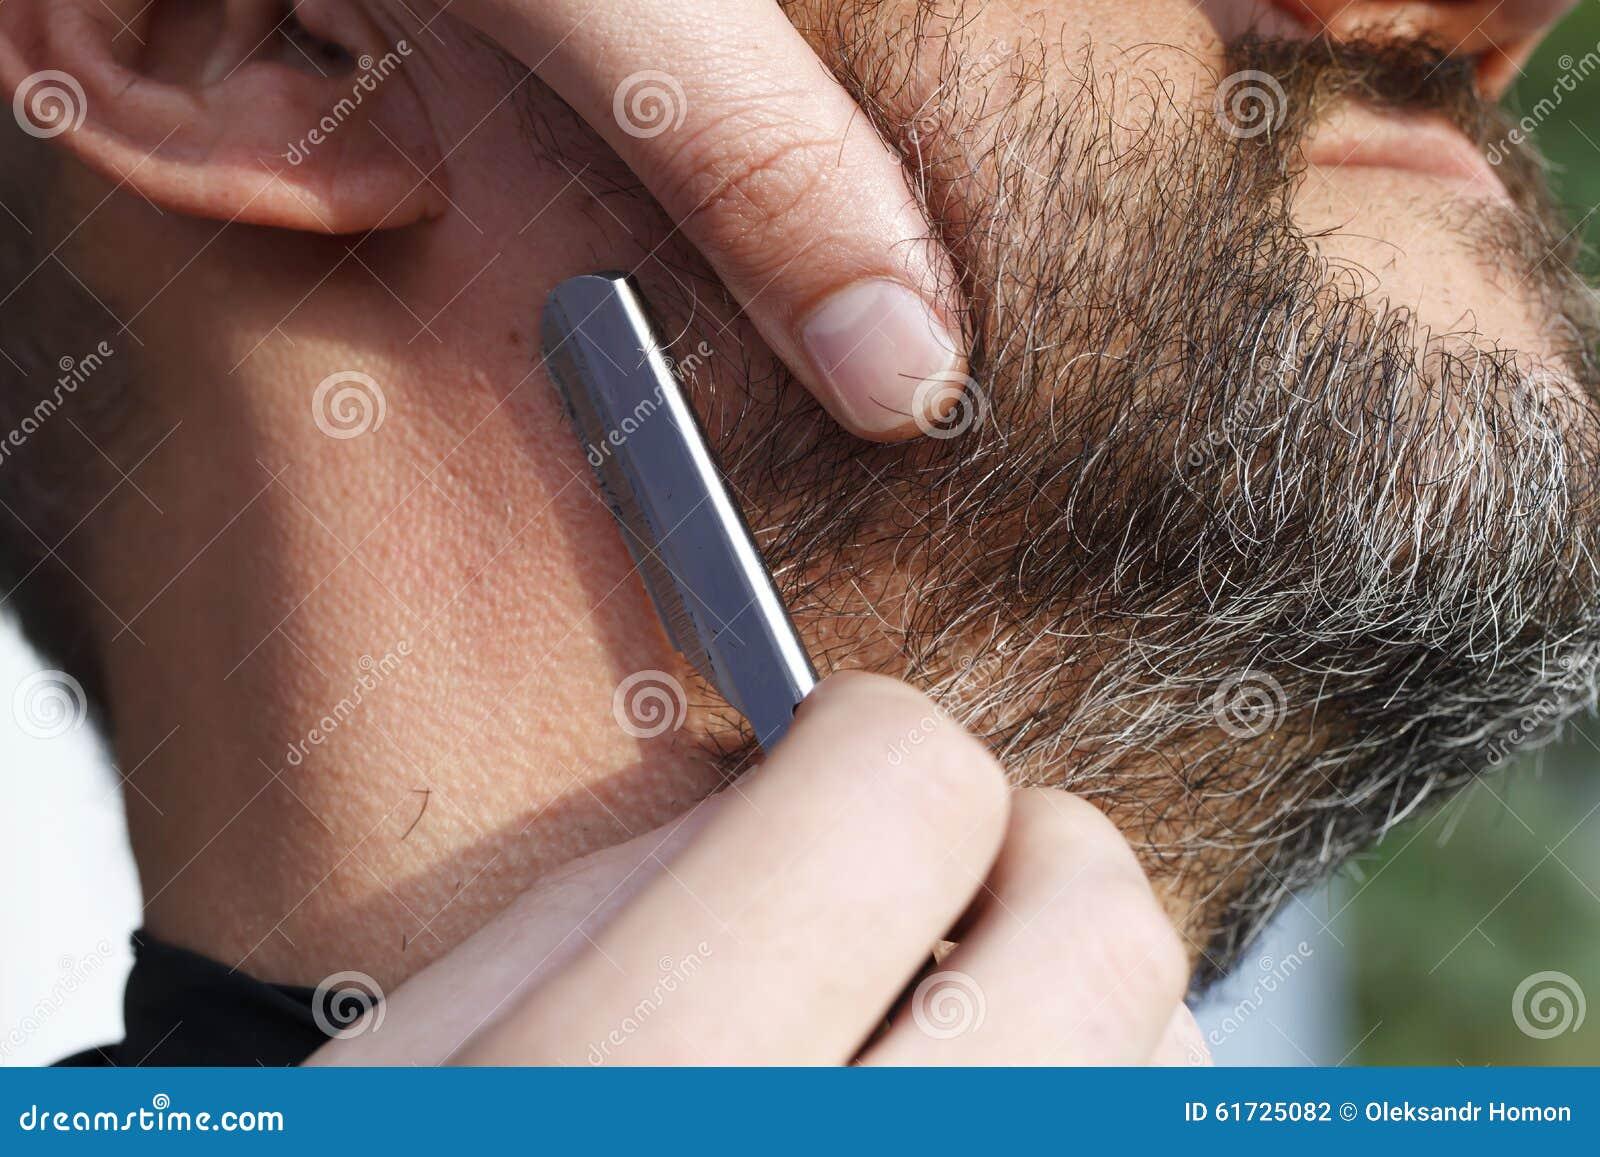 Master barber shears beard man